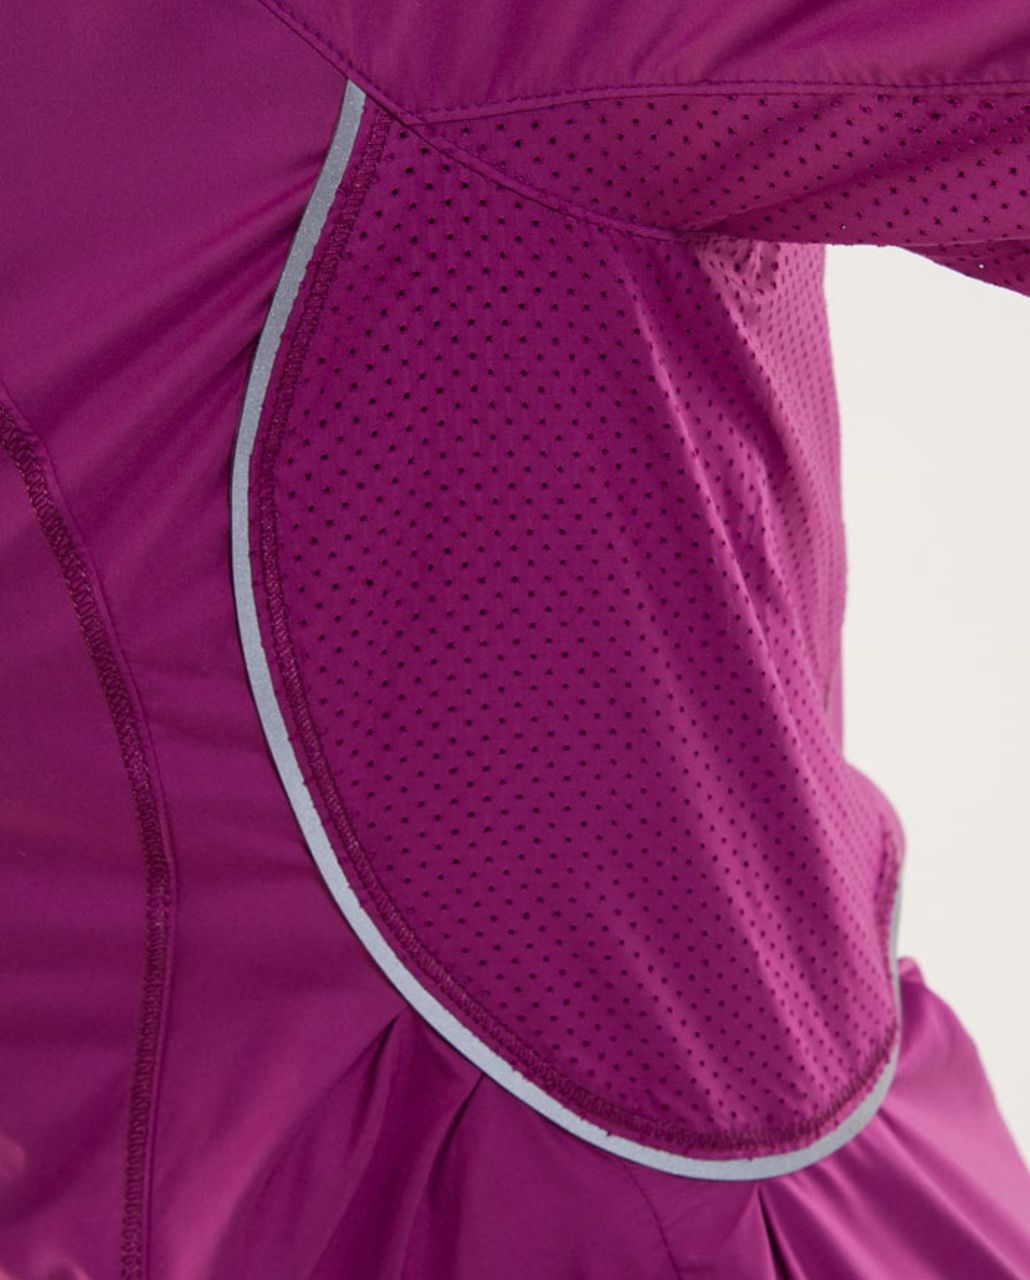 Lululemon Run:  Inspire Jacket - Dew Berry